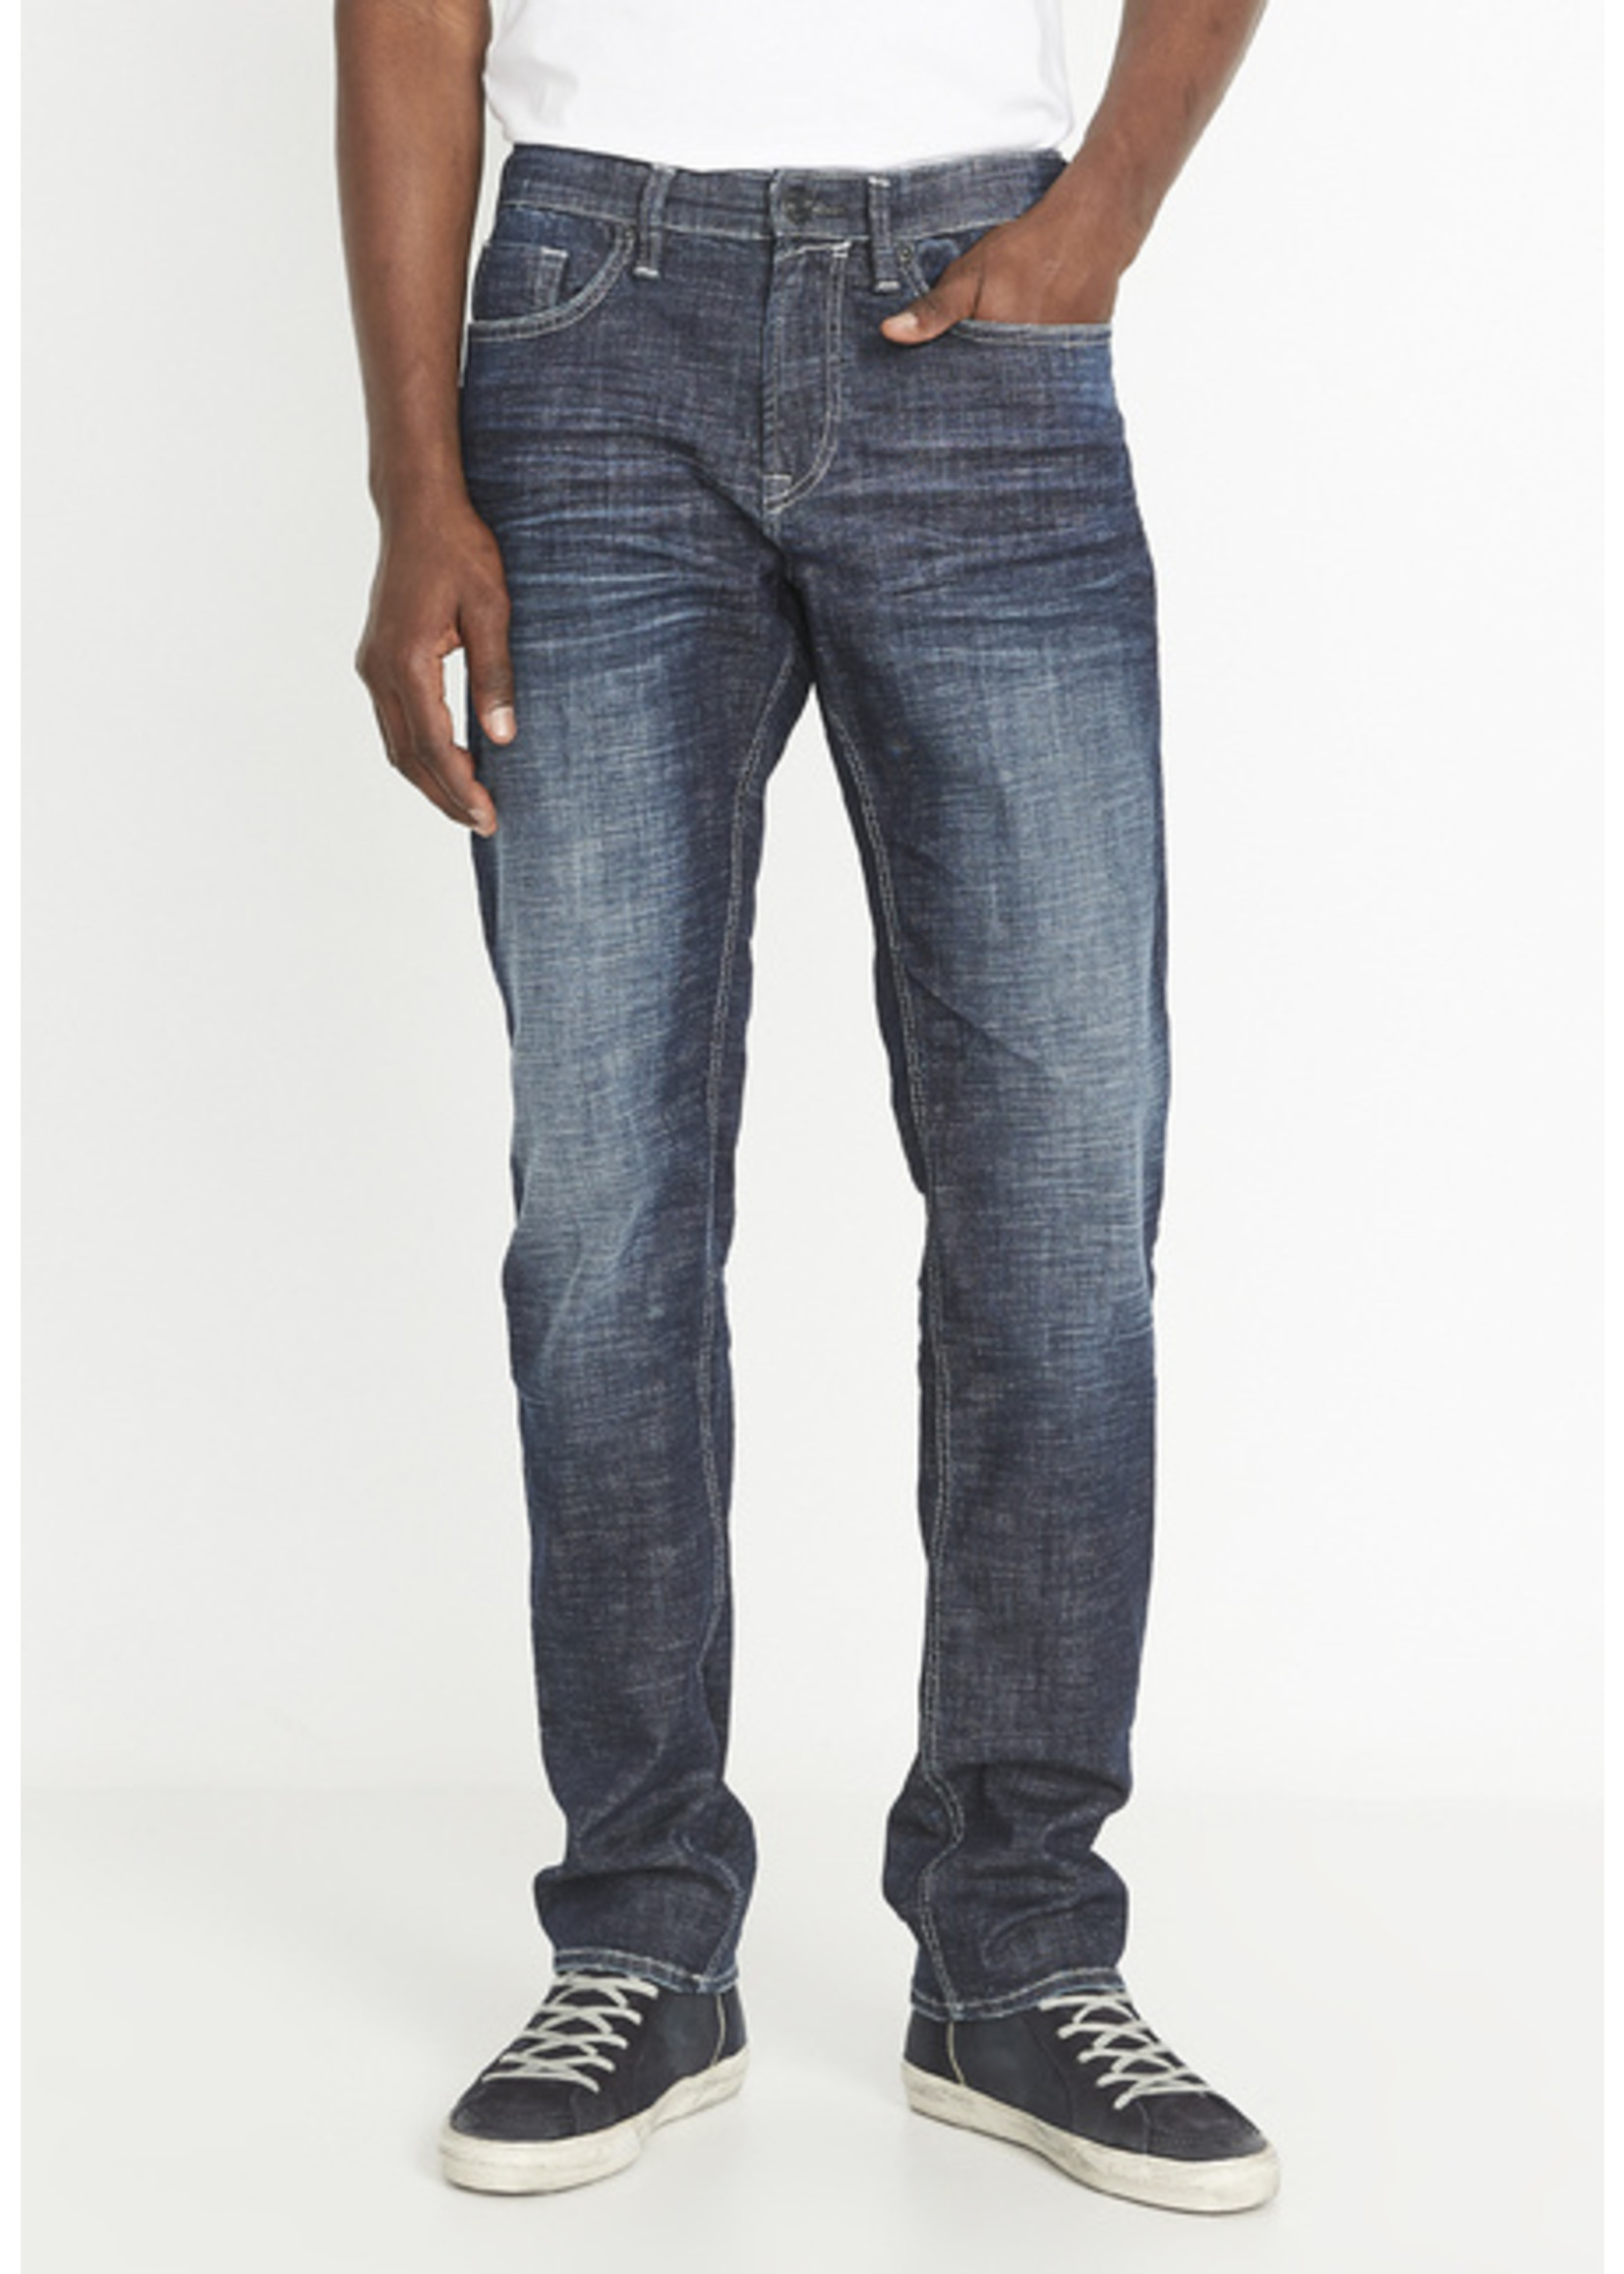 Buffalo David Bitton Bronco-X Jeans